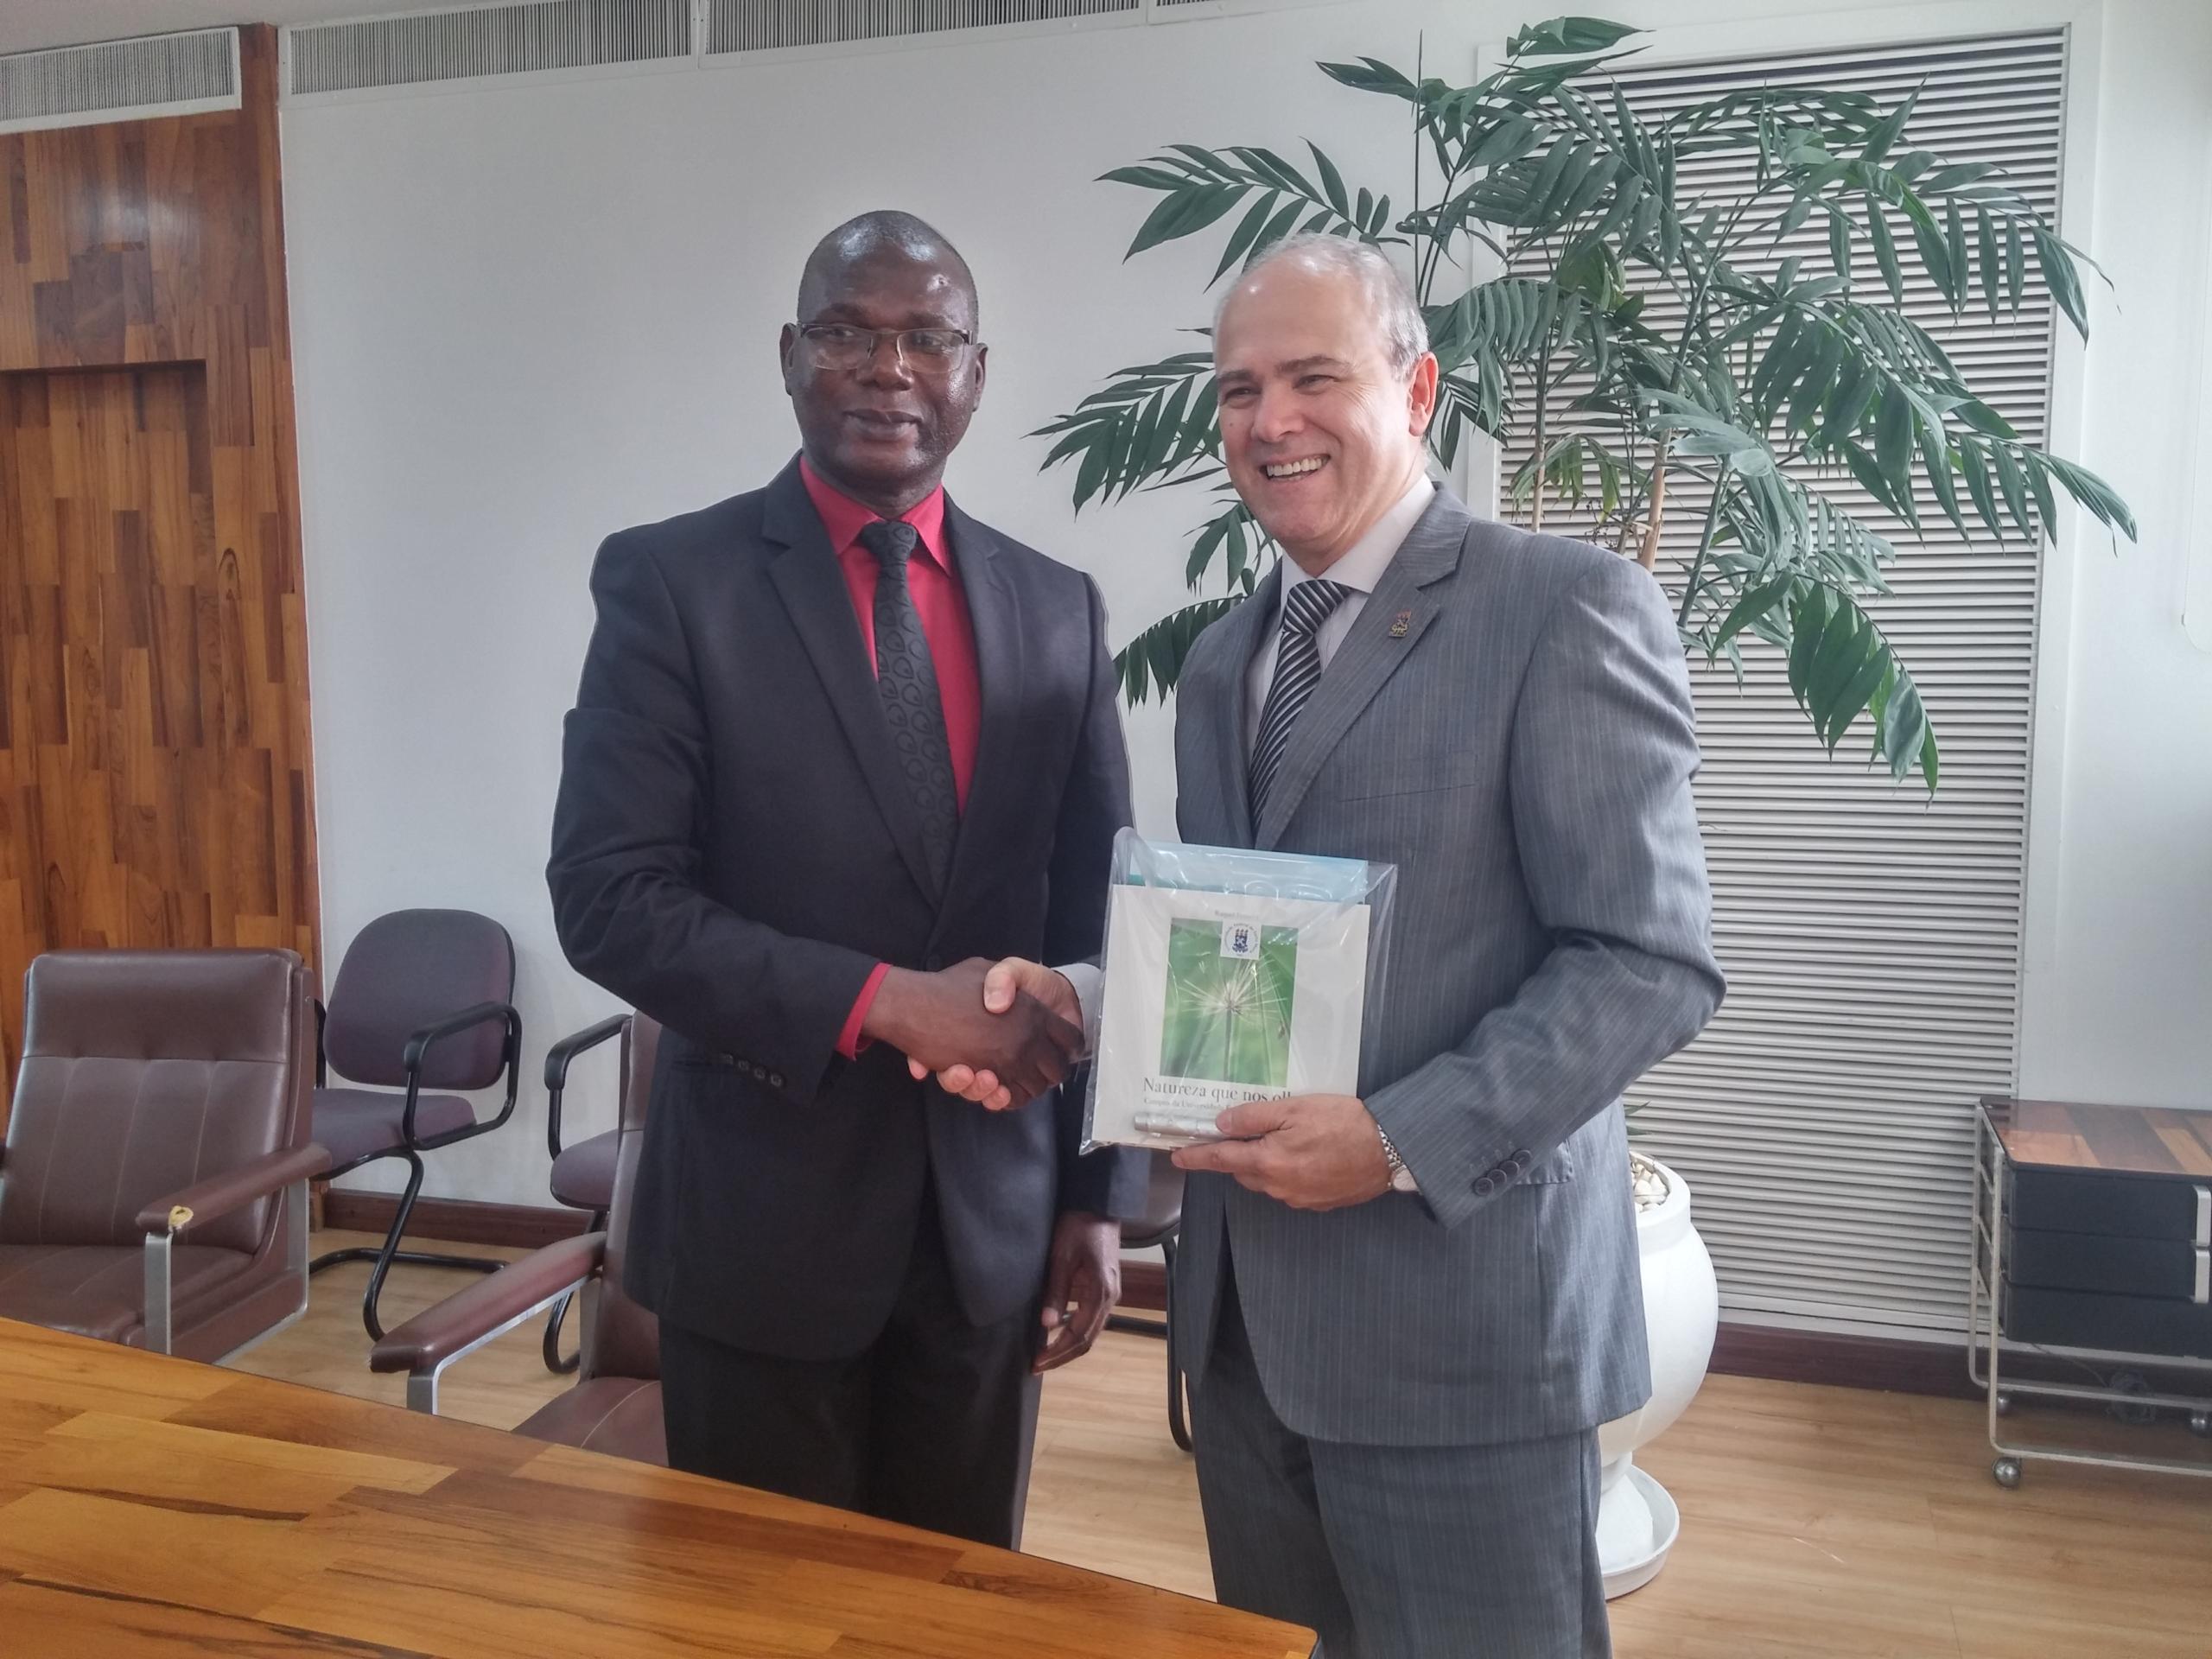 12 09 2017 Assinatura acordo Unizambeze Mirian Quadros 4